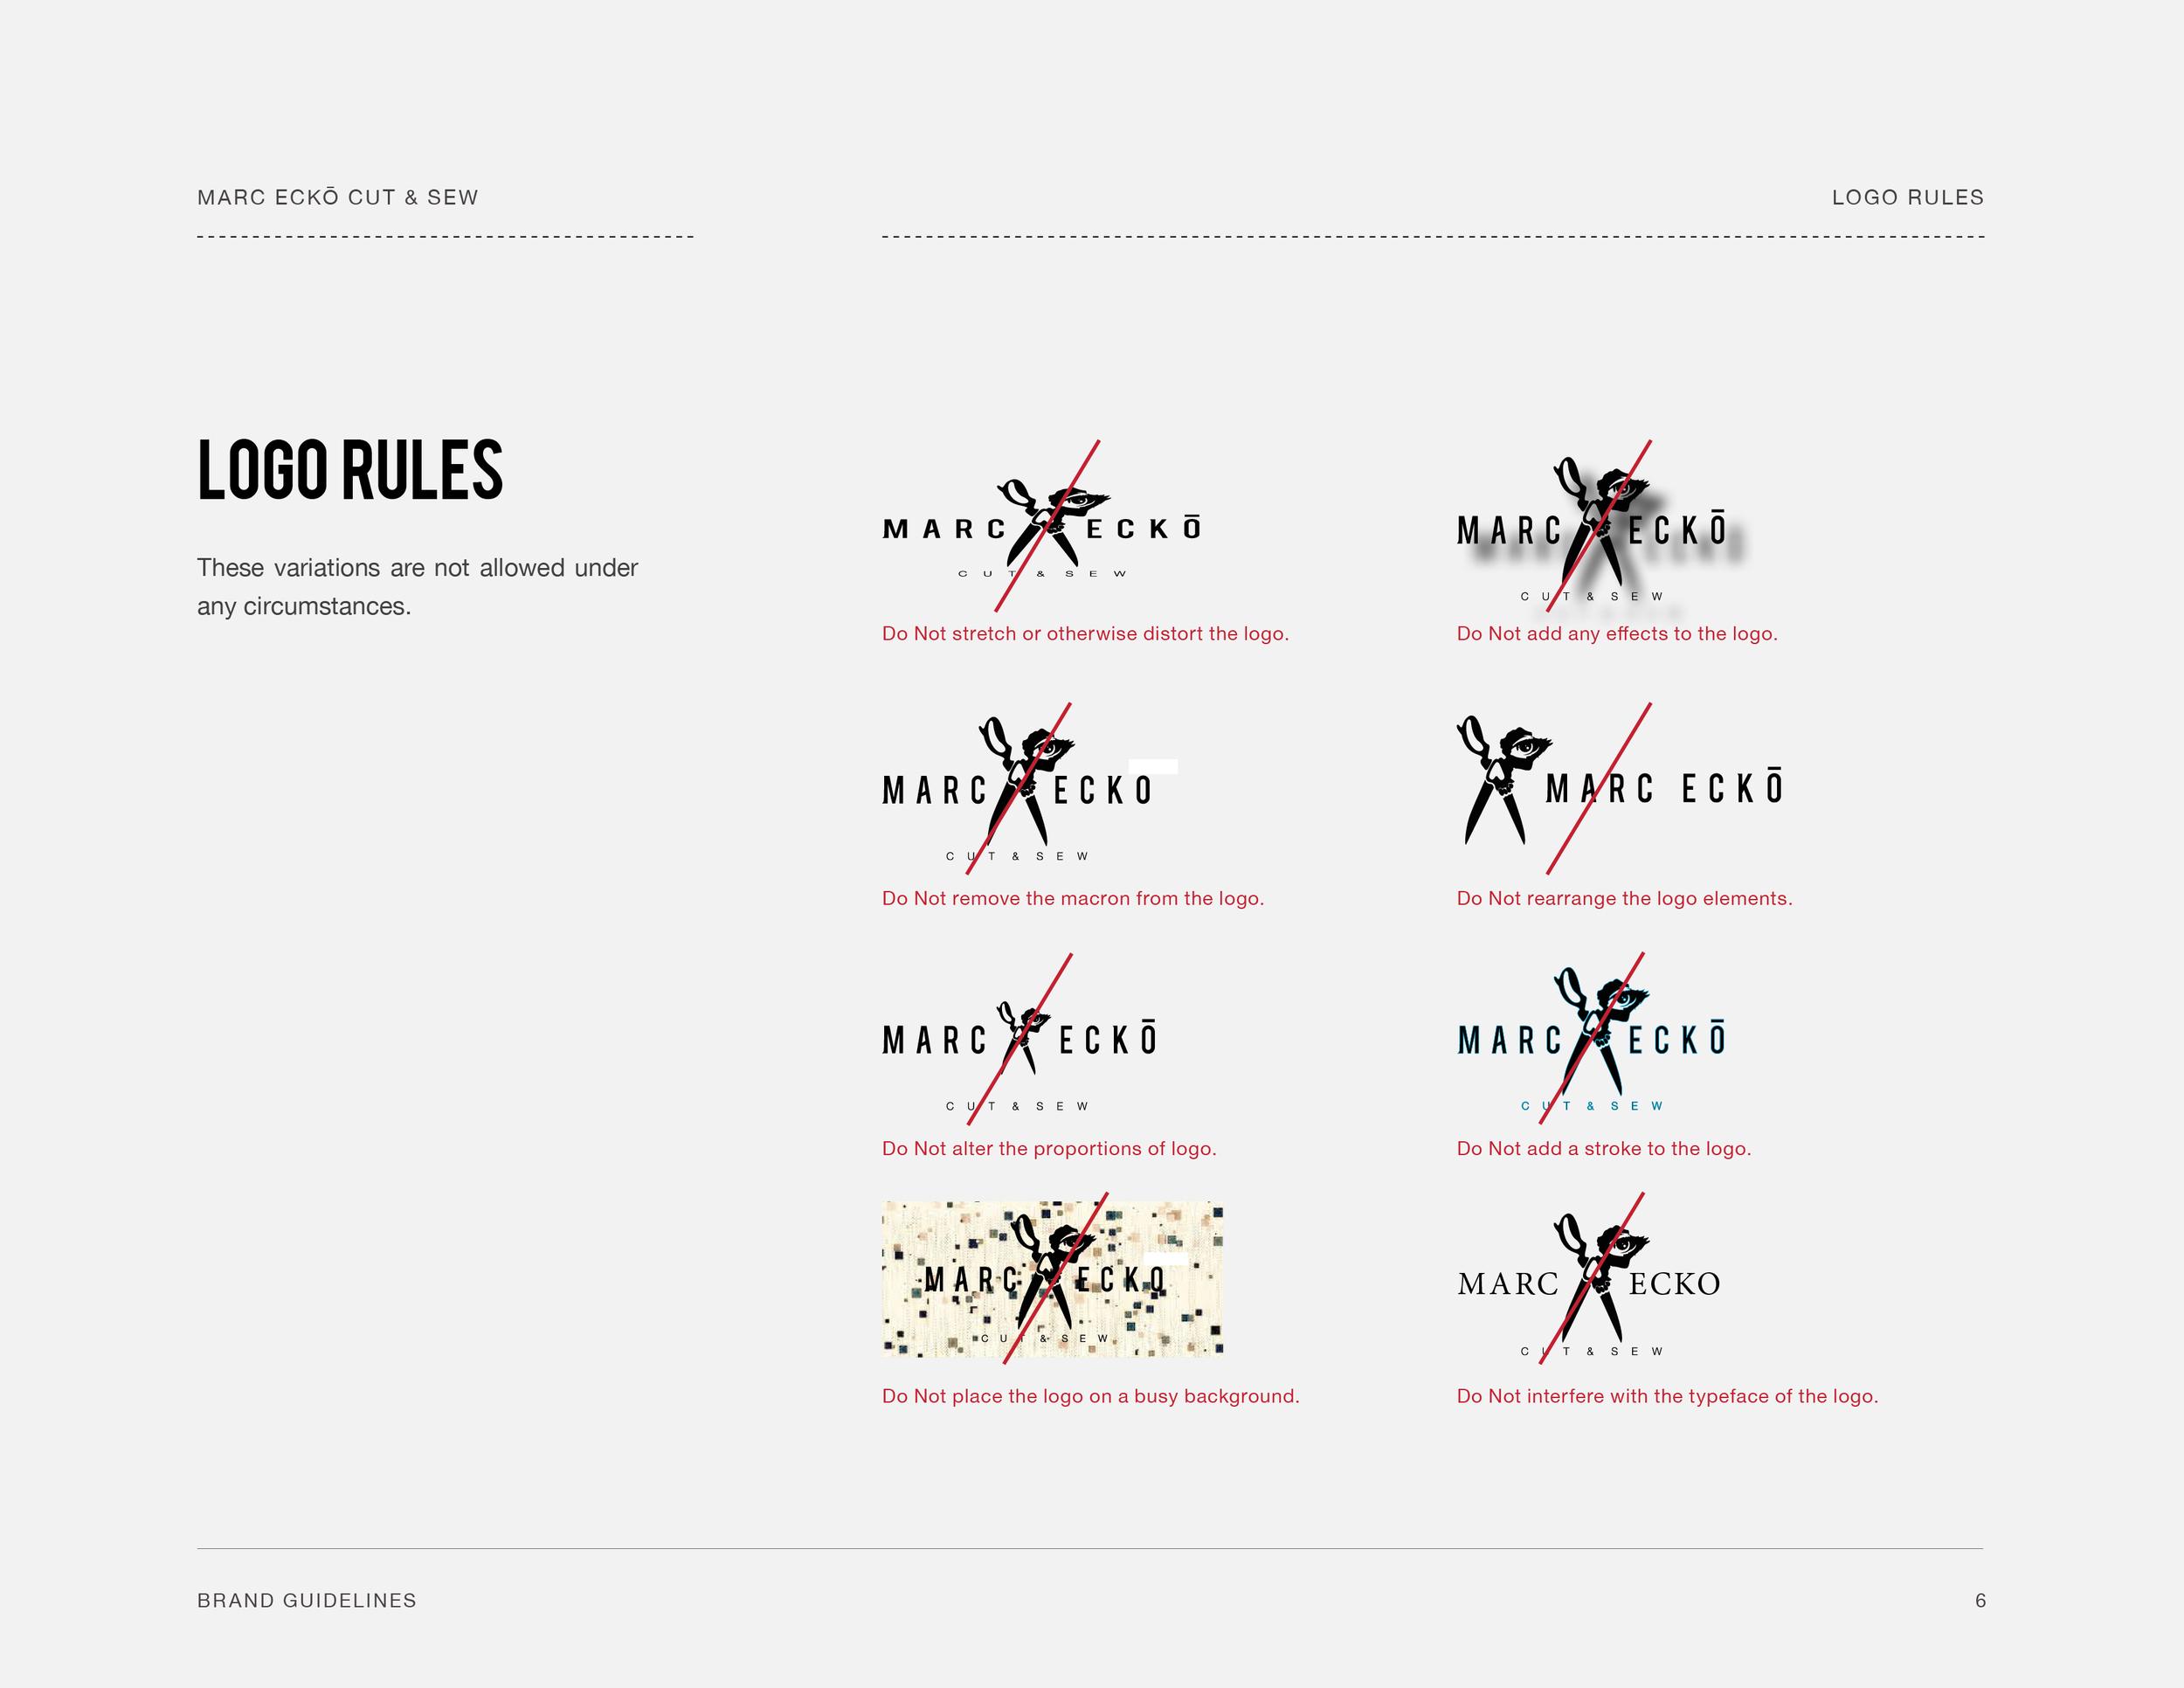 Marc-Ecko-brand-guidelines9.jpg